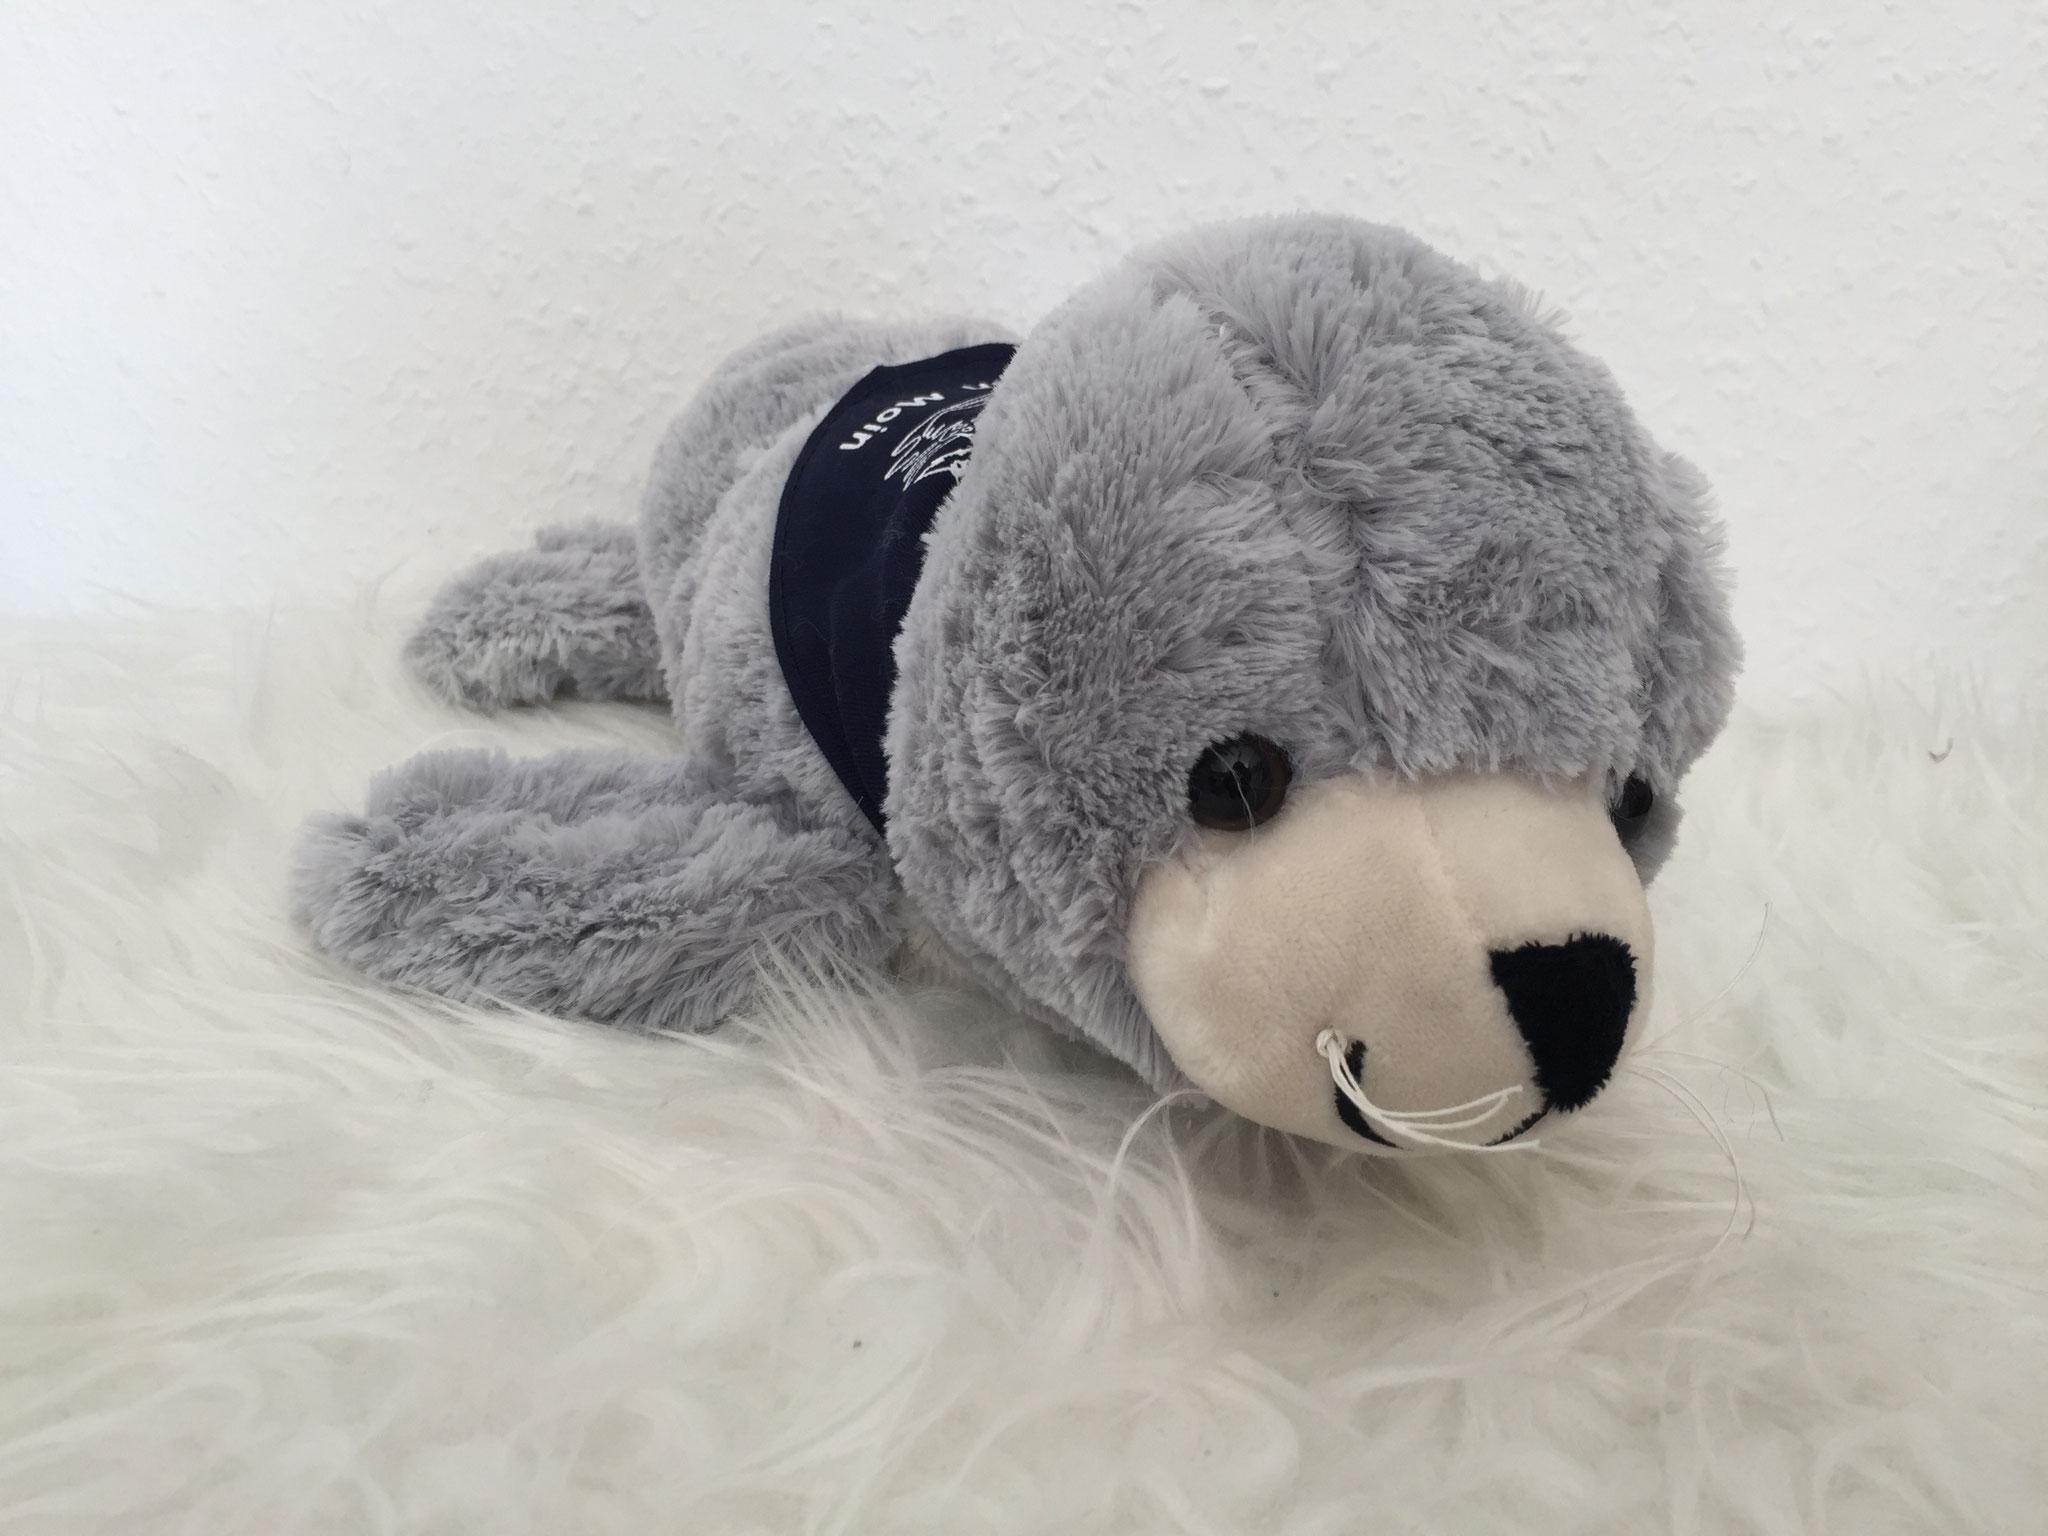 Klasse 1a - Klassenlehrerin Frau Reploh – Klassentier Piet, der Seehund